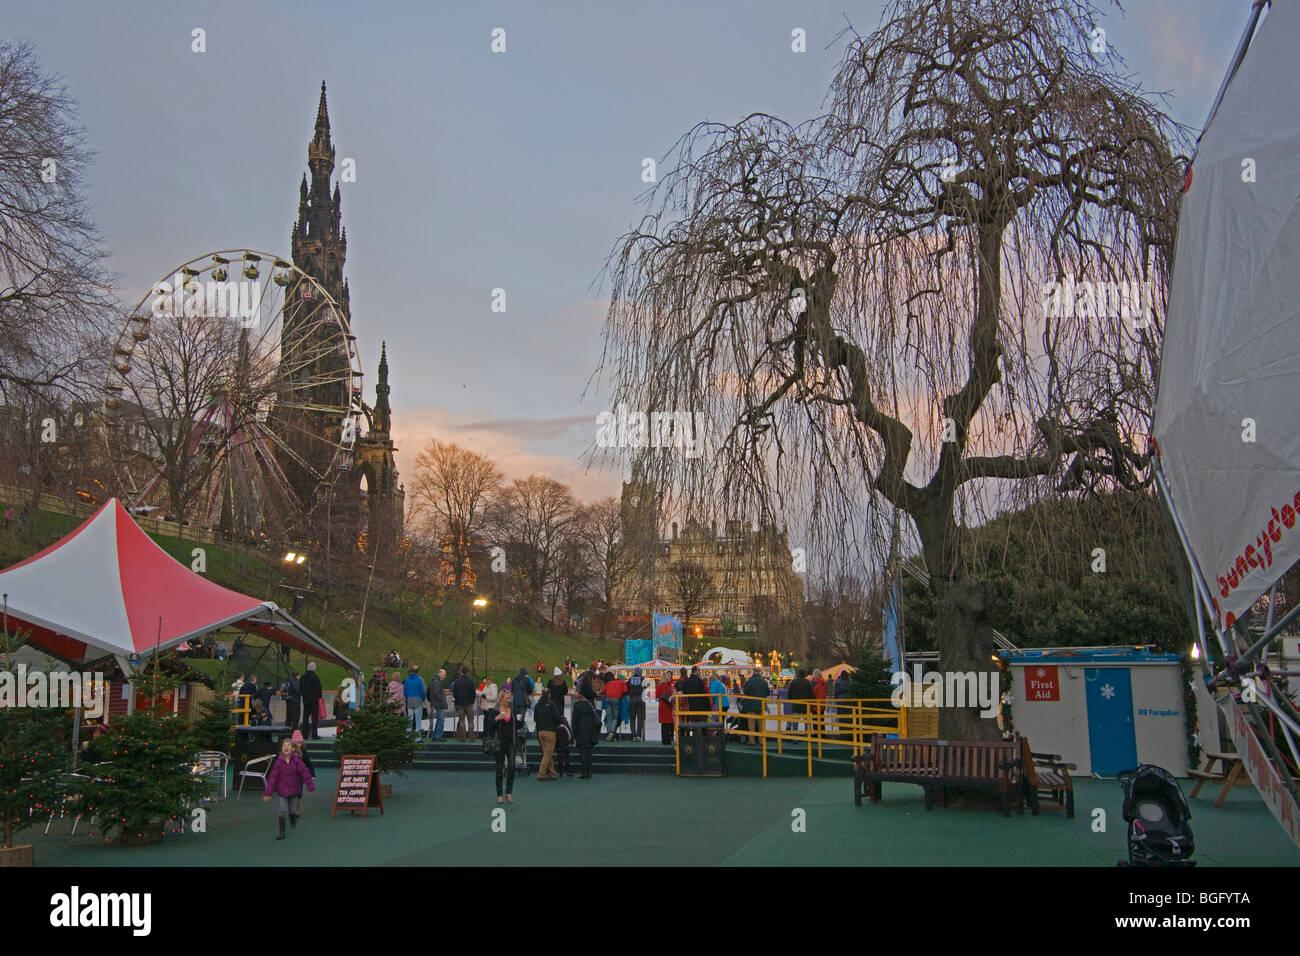 Edinburgh, sunset, ice rink, Princes Street Gardens, Scotland, November, 2009 Stock Photo